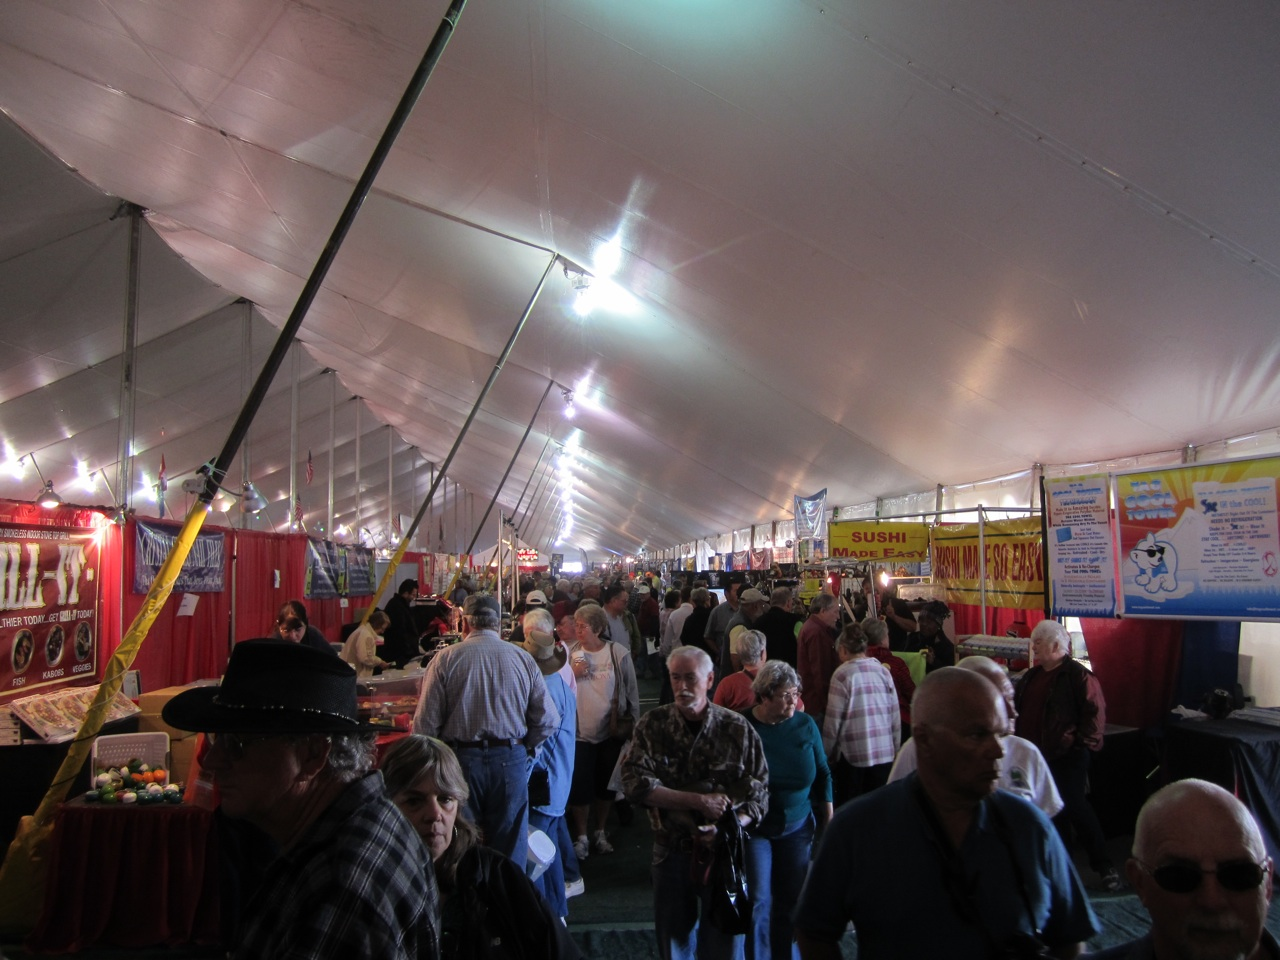 Inside The Main RV Tent At Quartzsite, AZ